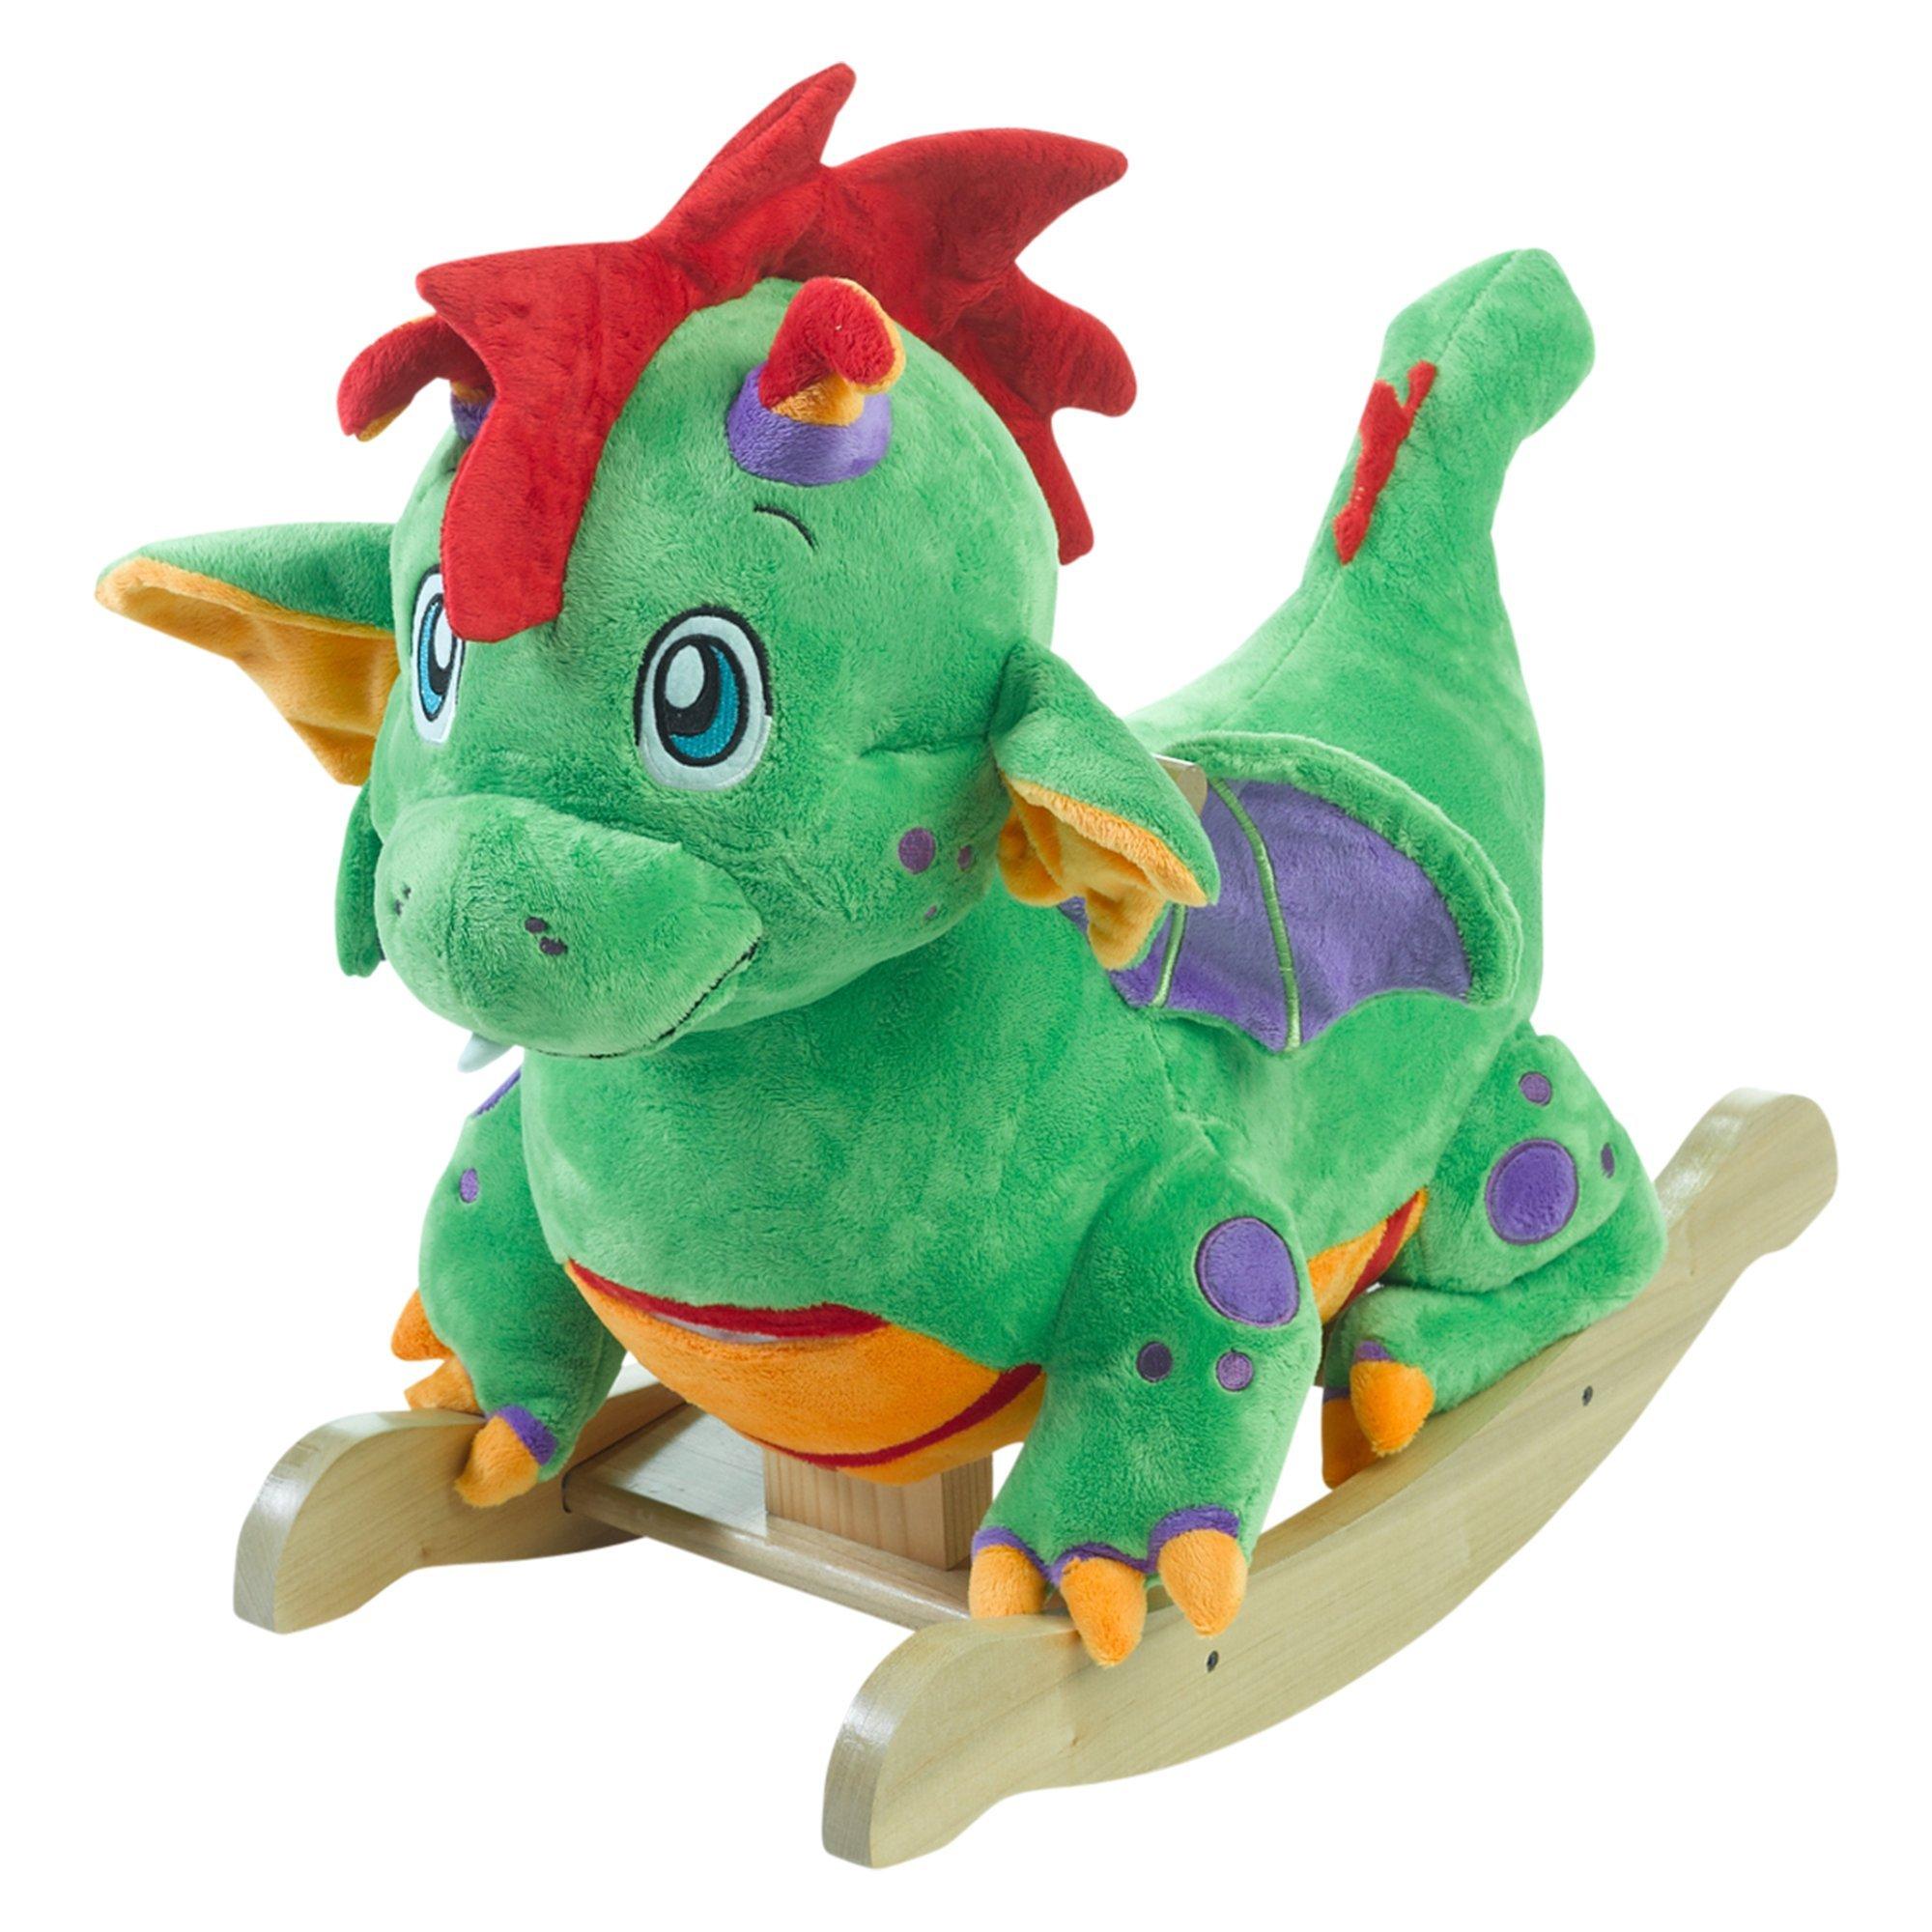 Rockabye Poof the Lil' Dragon Rocker, One Size